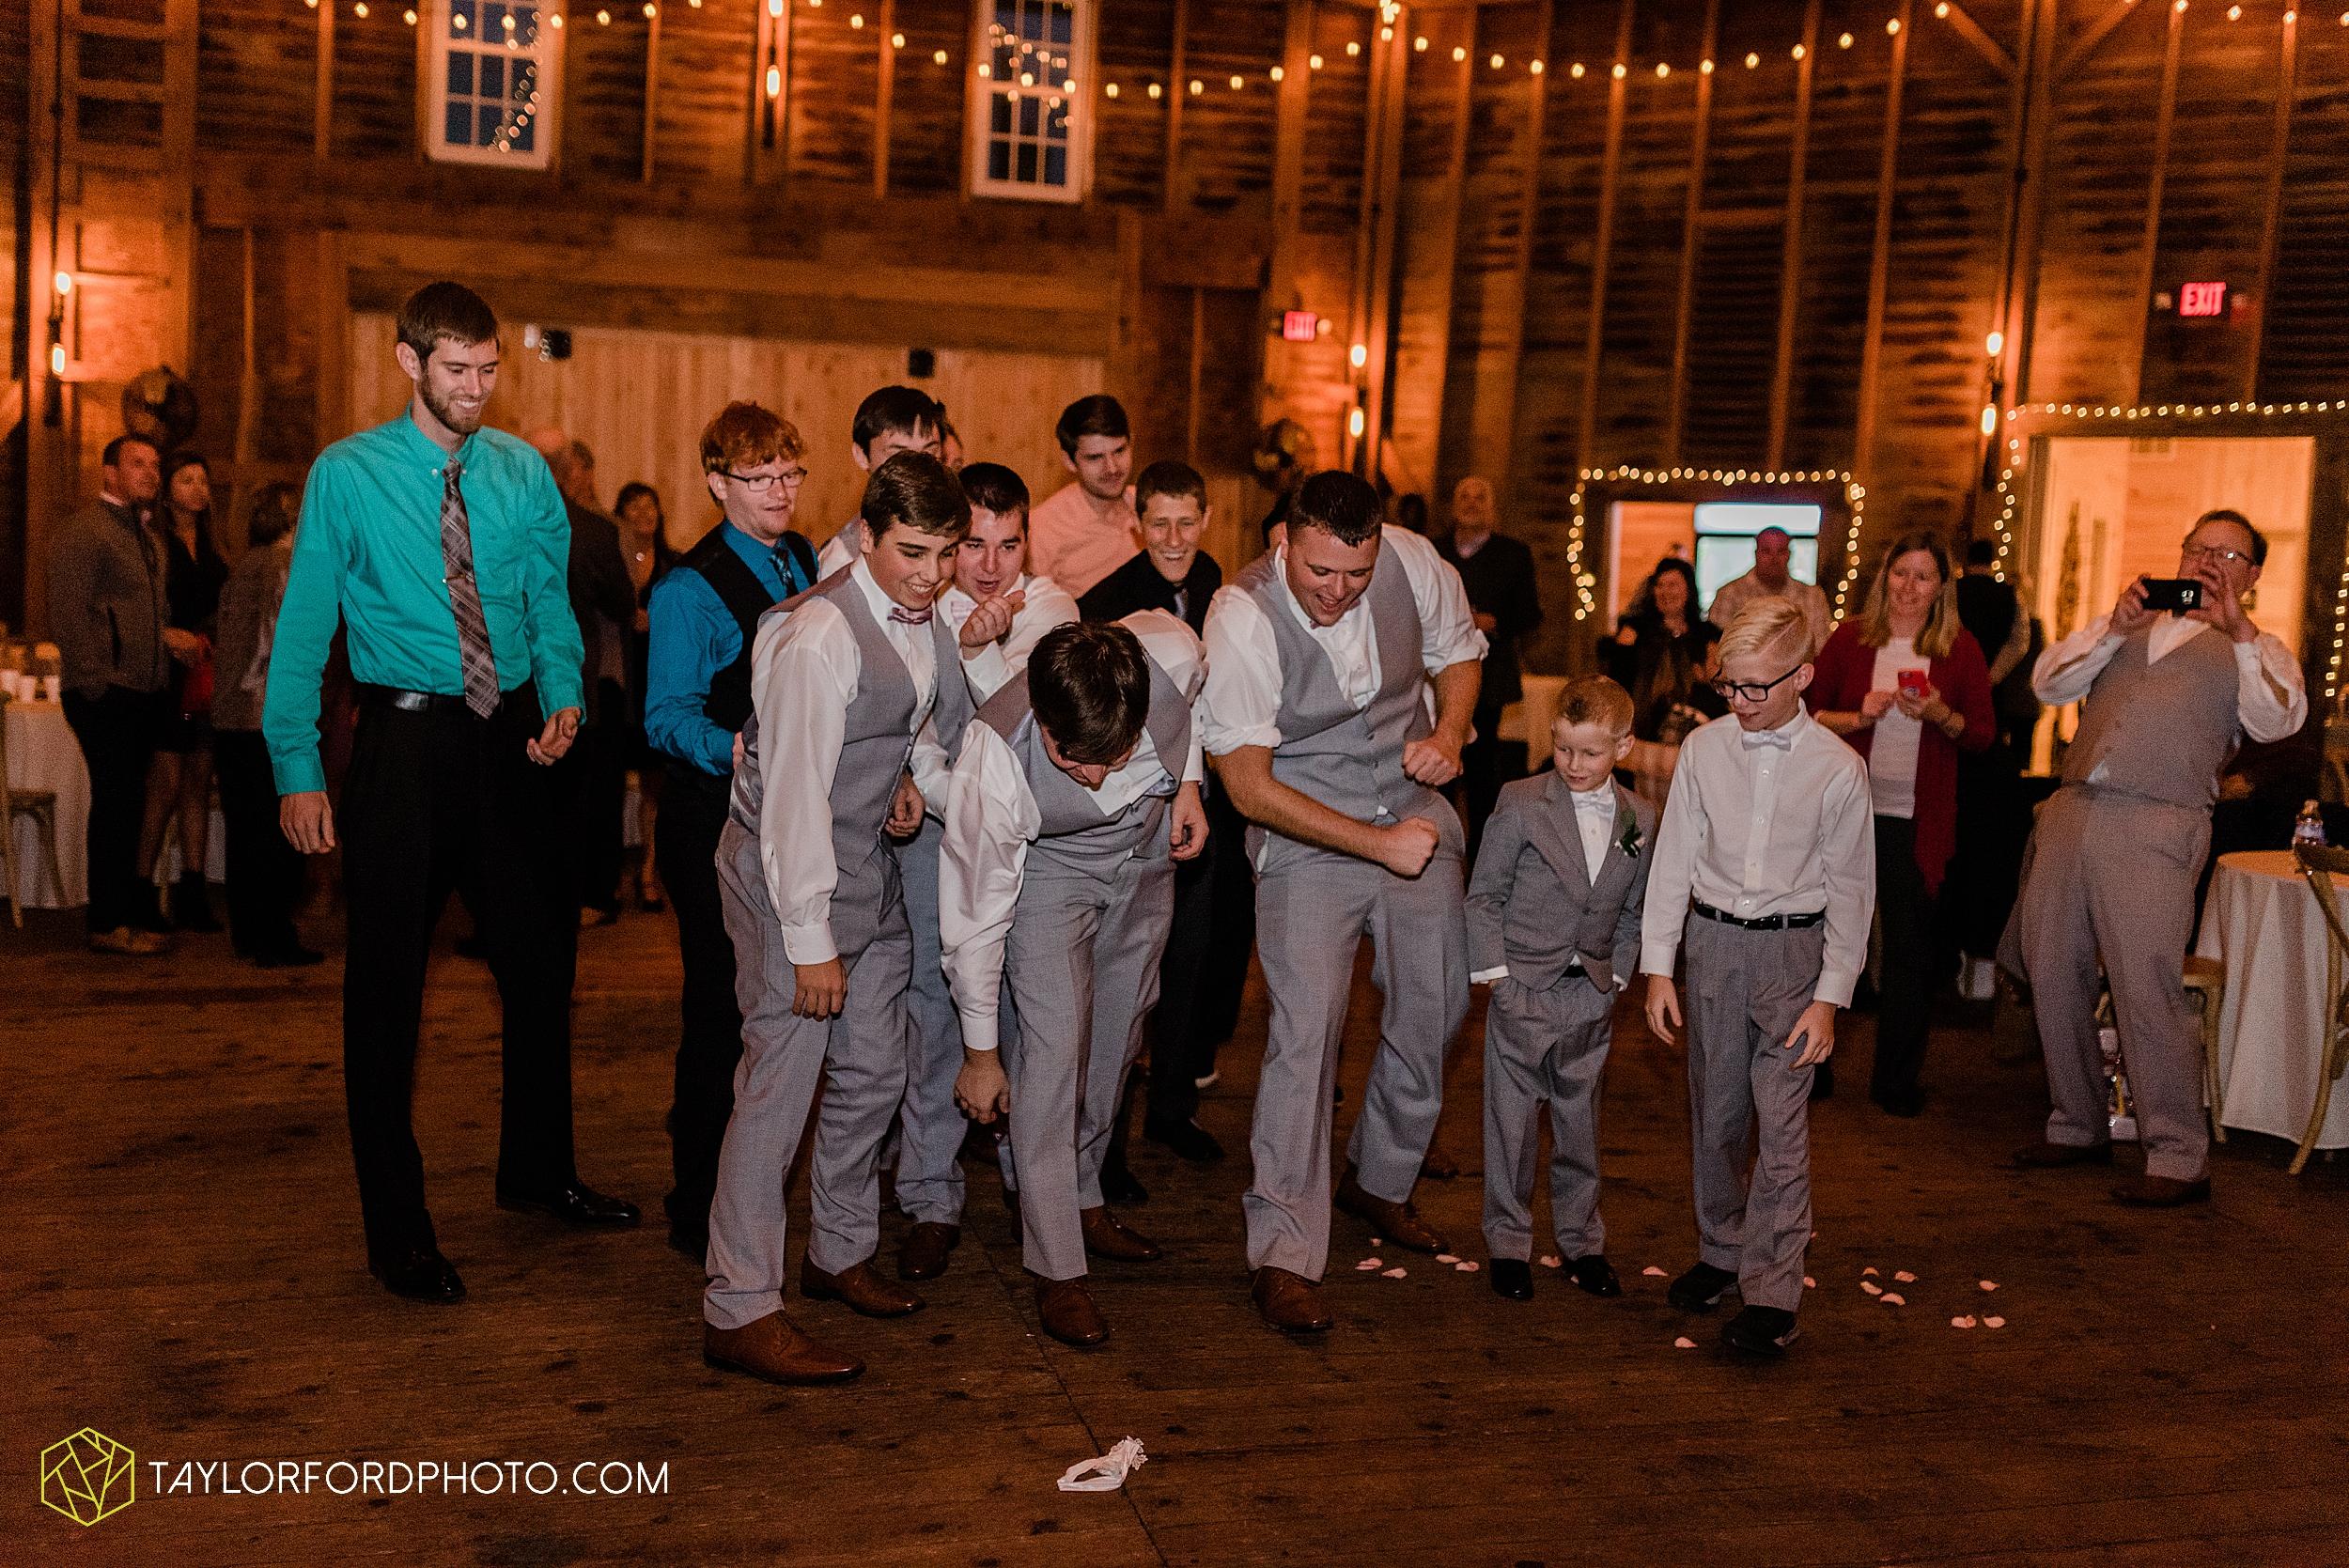 marissa-nicole-nick-daeger-orrmont-estate-farm-wedding-piqua-dayton-troy-ohio-fall-photographer-taylor-ford-photography_1568.jpg